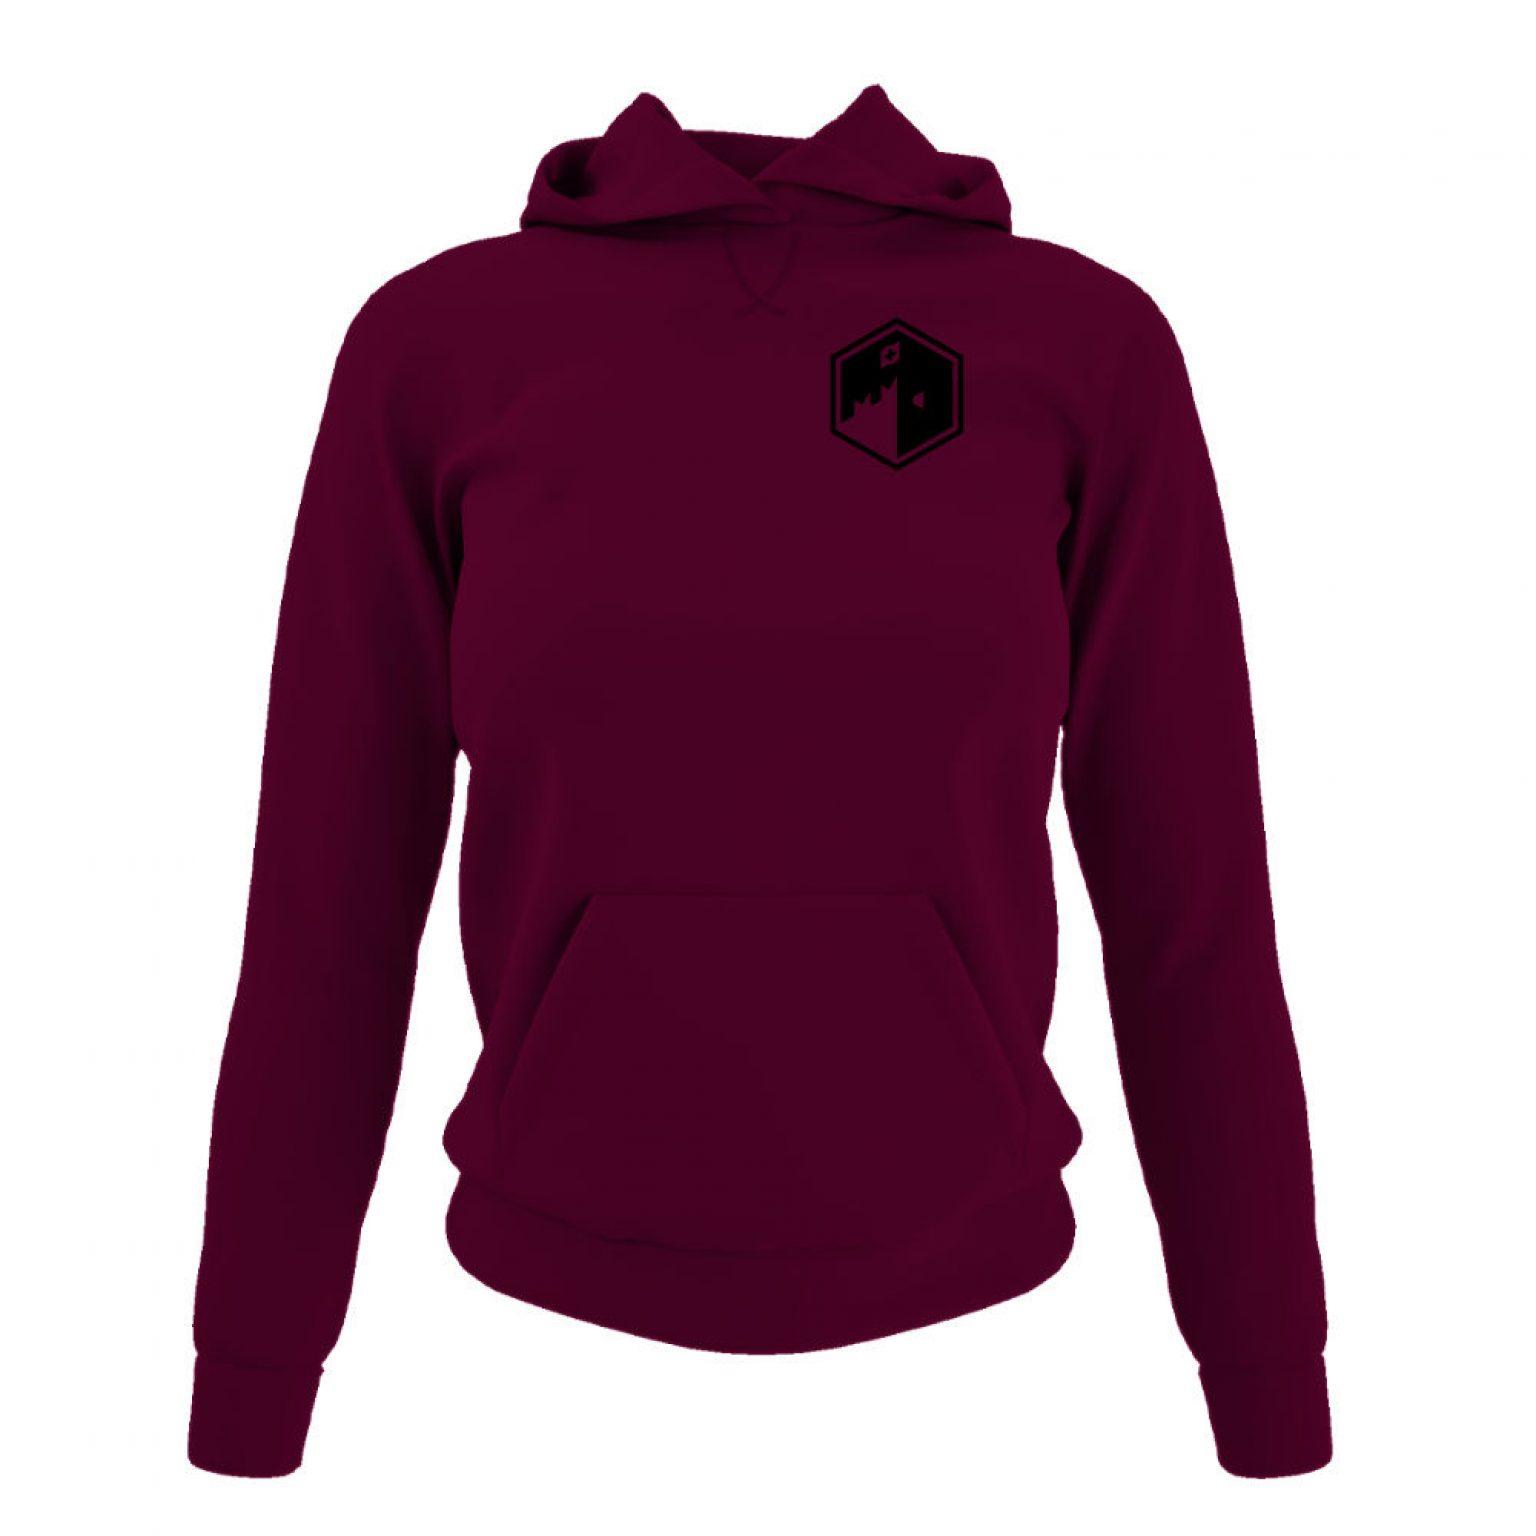 CFB hoodie damen burgundy front